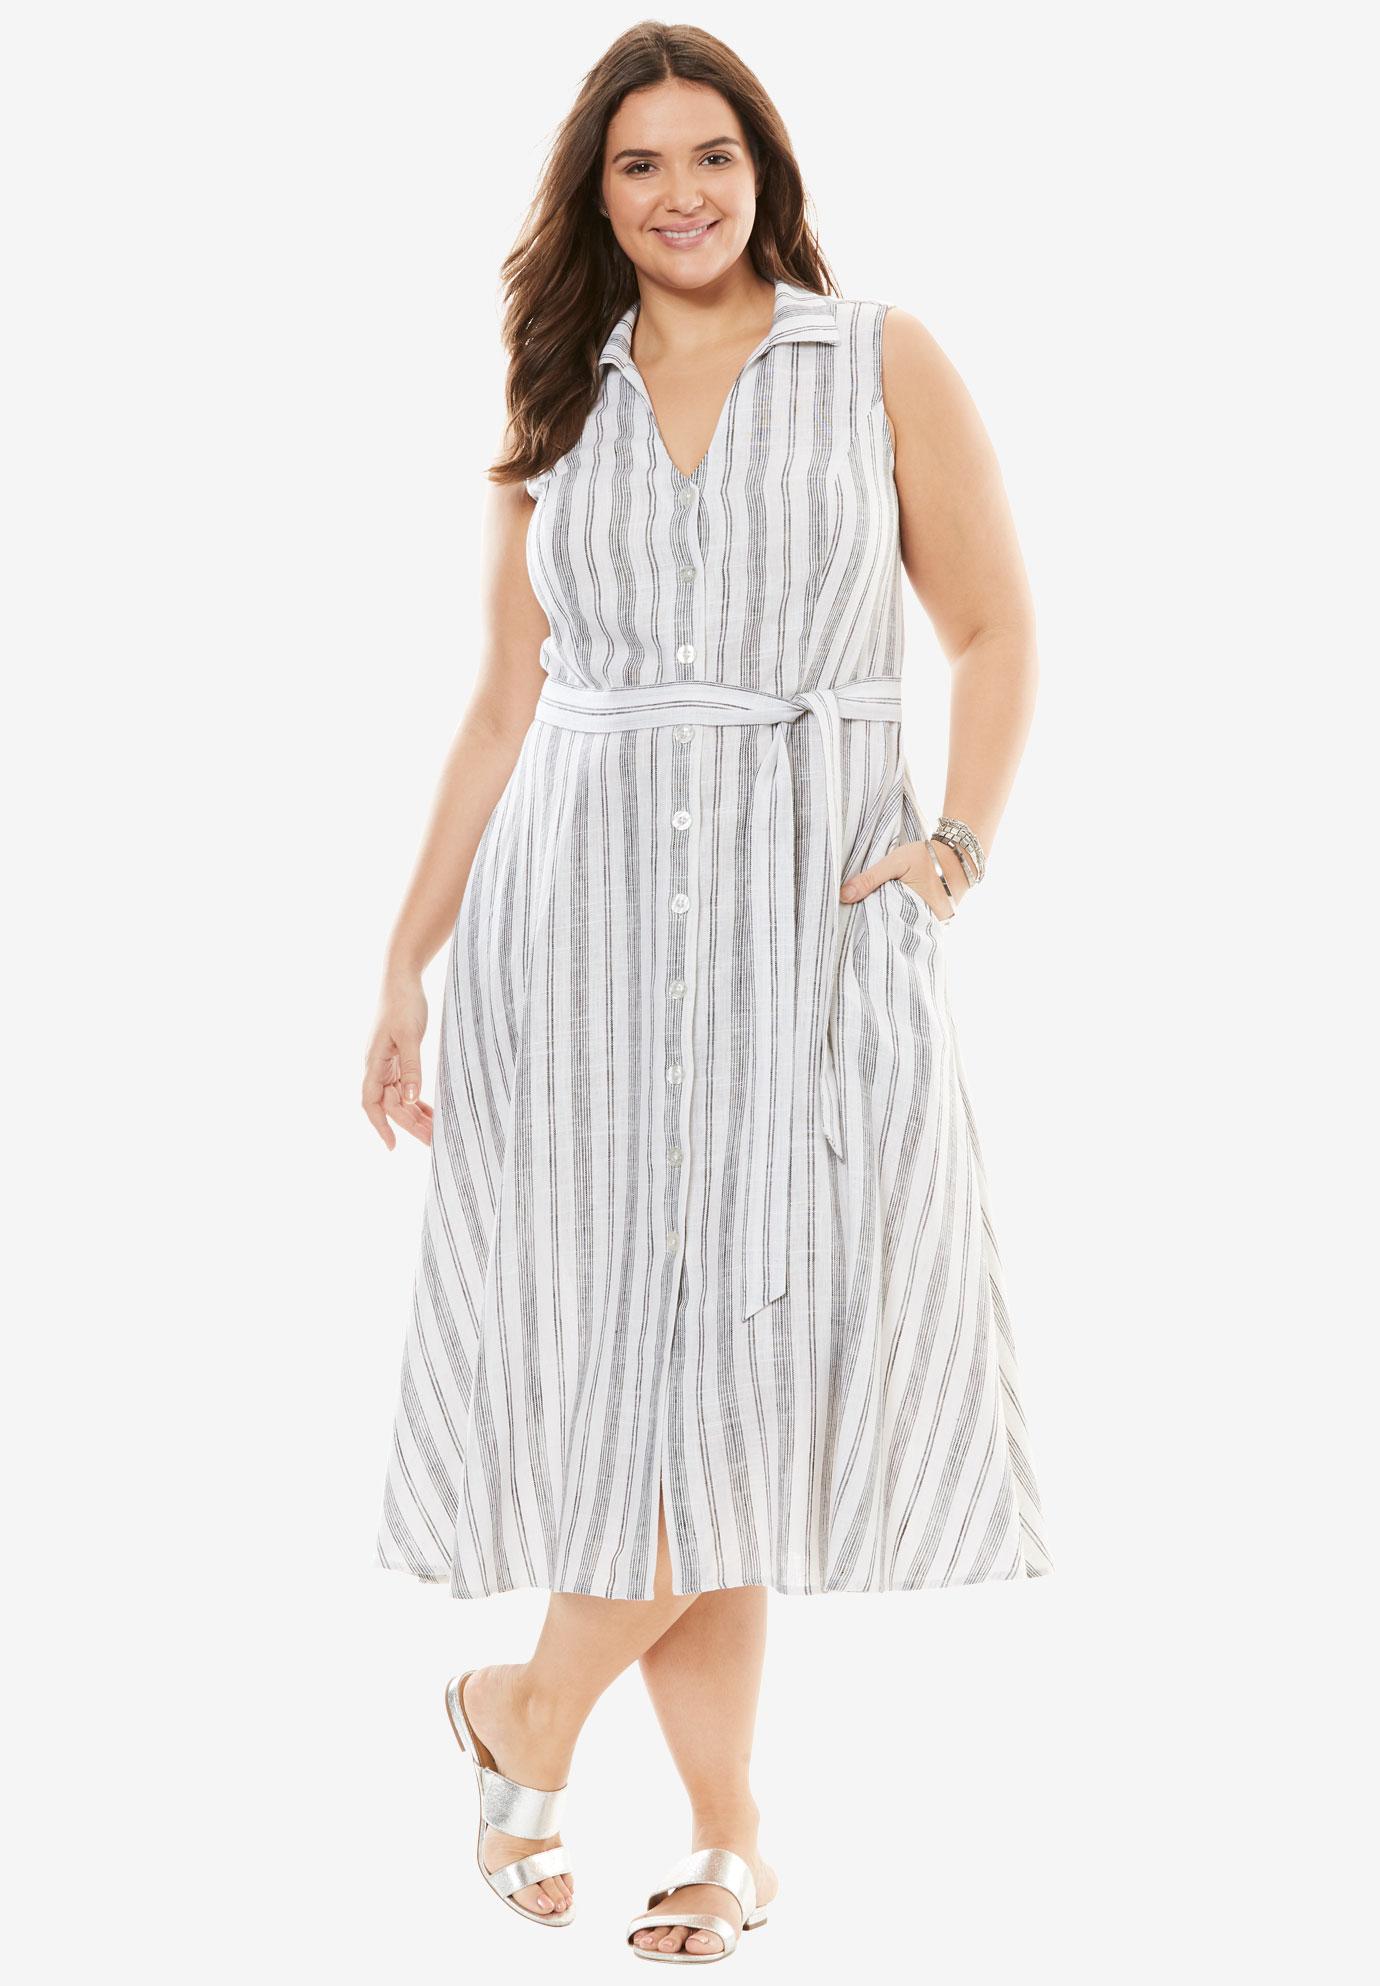 6d382e29d Striped Linen Shirtdress with Collar| Plus Size Casual Dresses ...